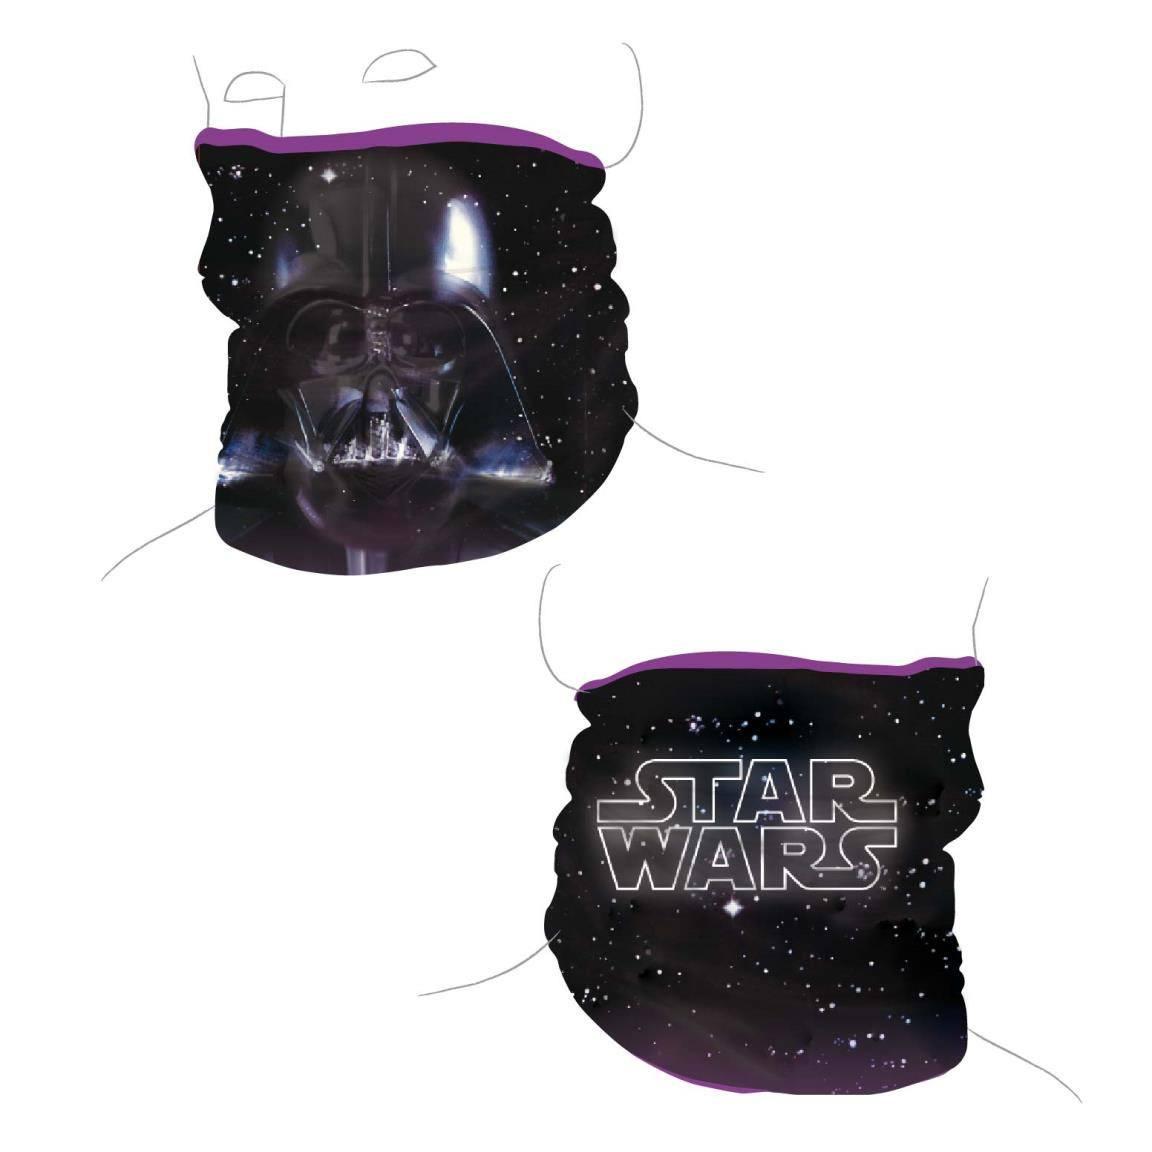 Star Wars Tube Scarf Darth Vader